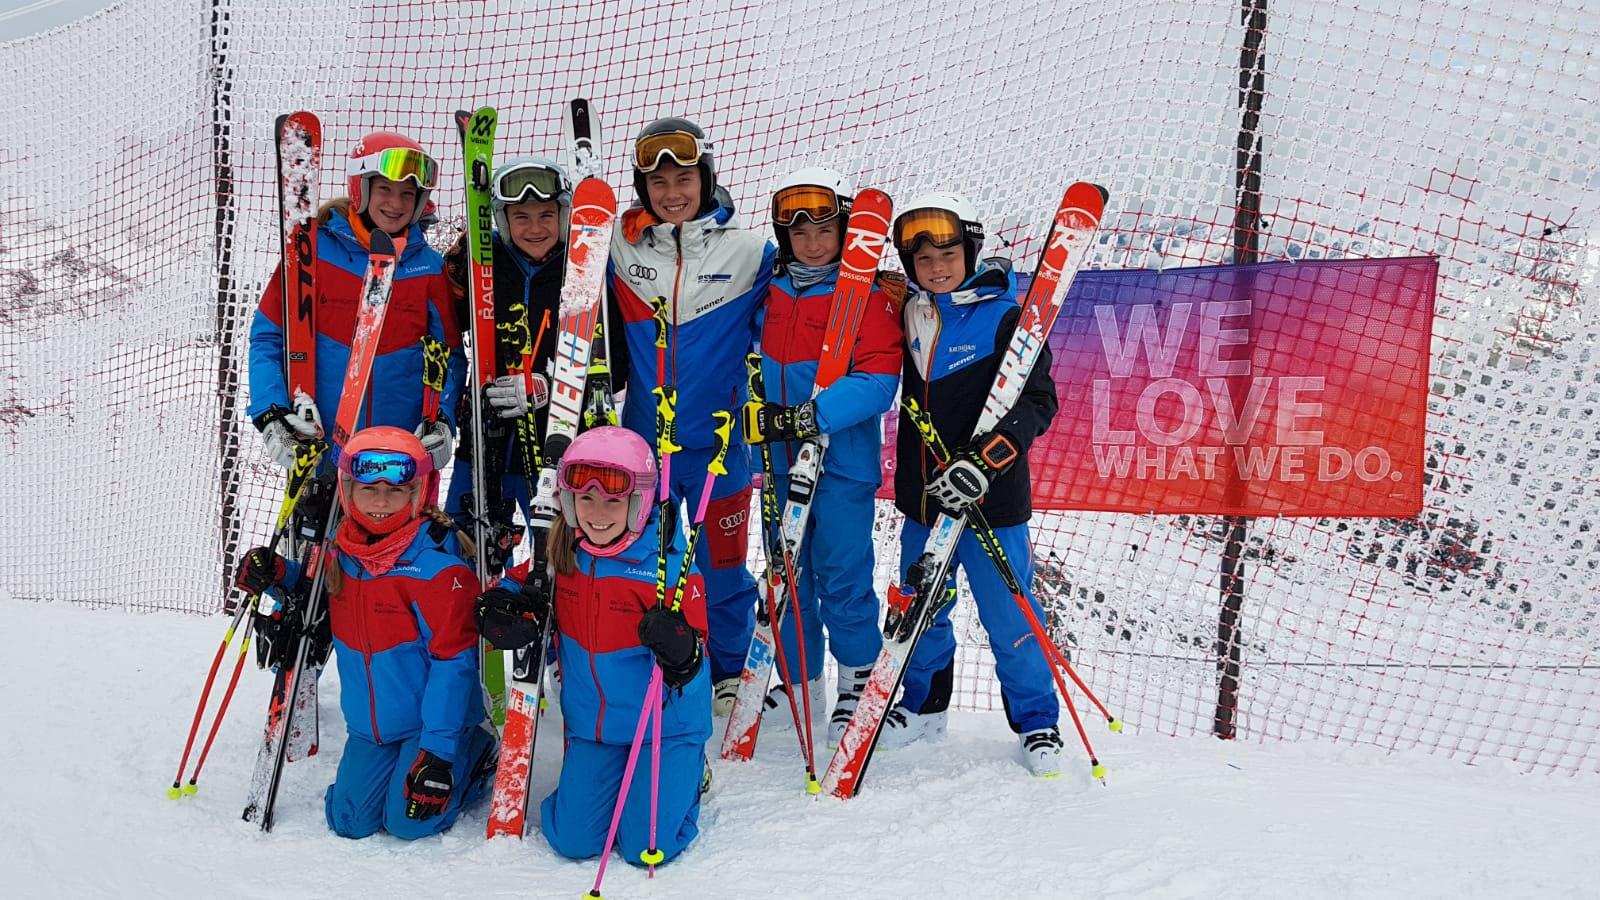 19_10-Trainingsteam-des-Skiclub-Koenigsbrunn